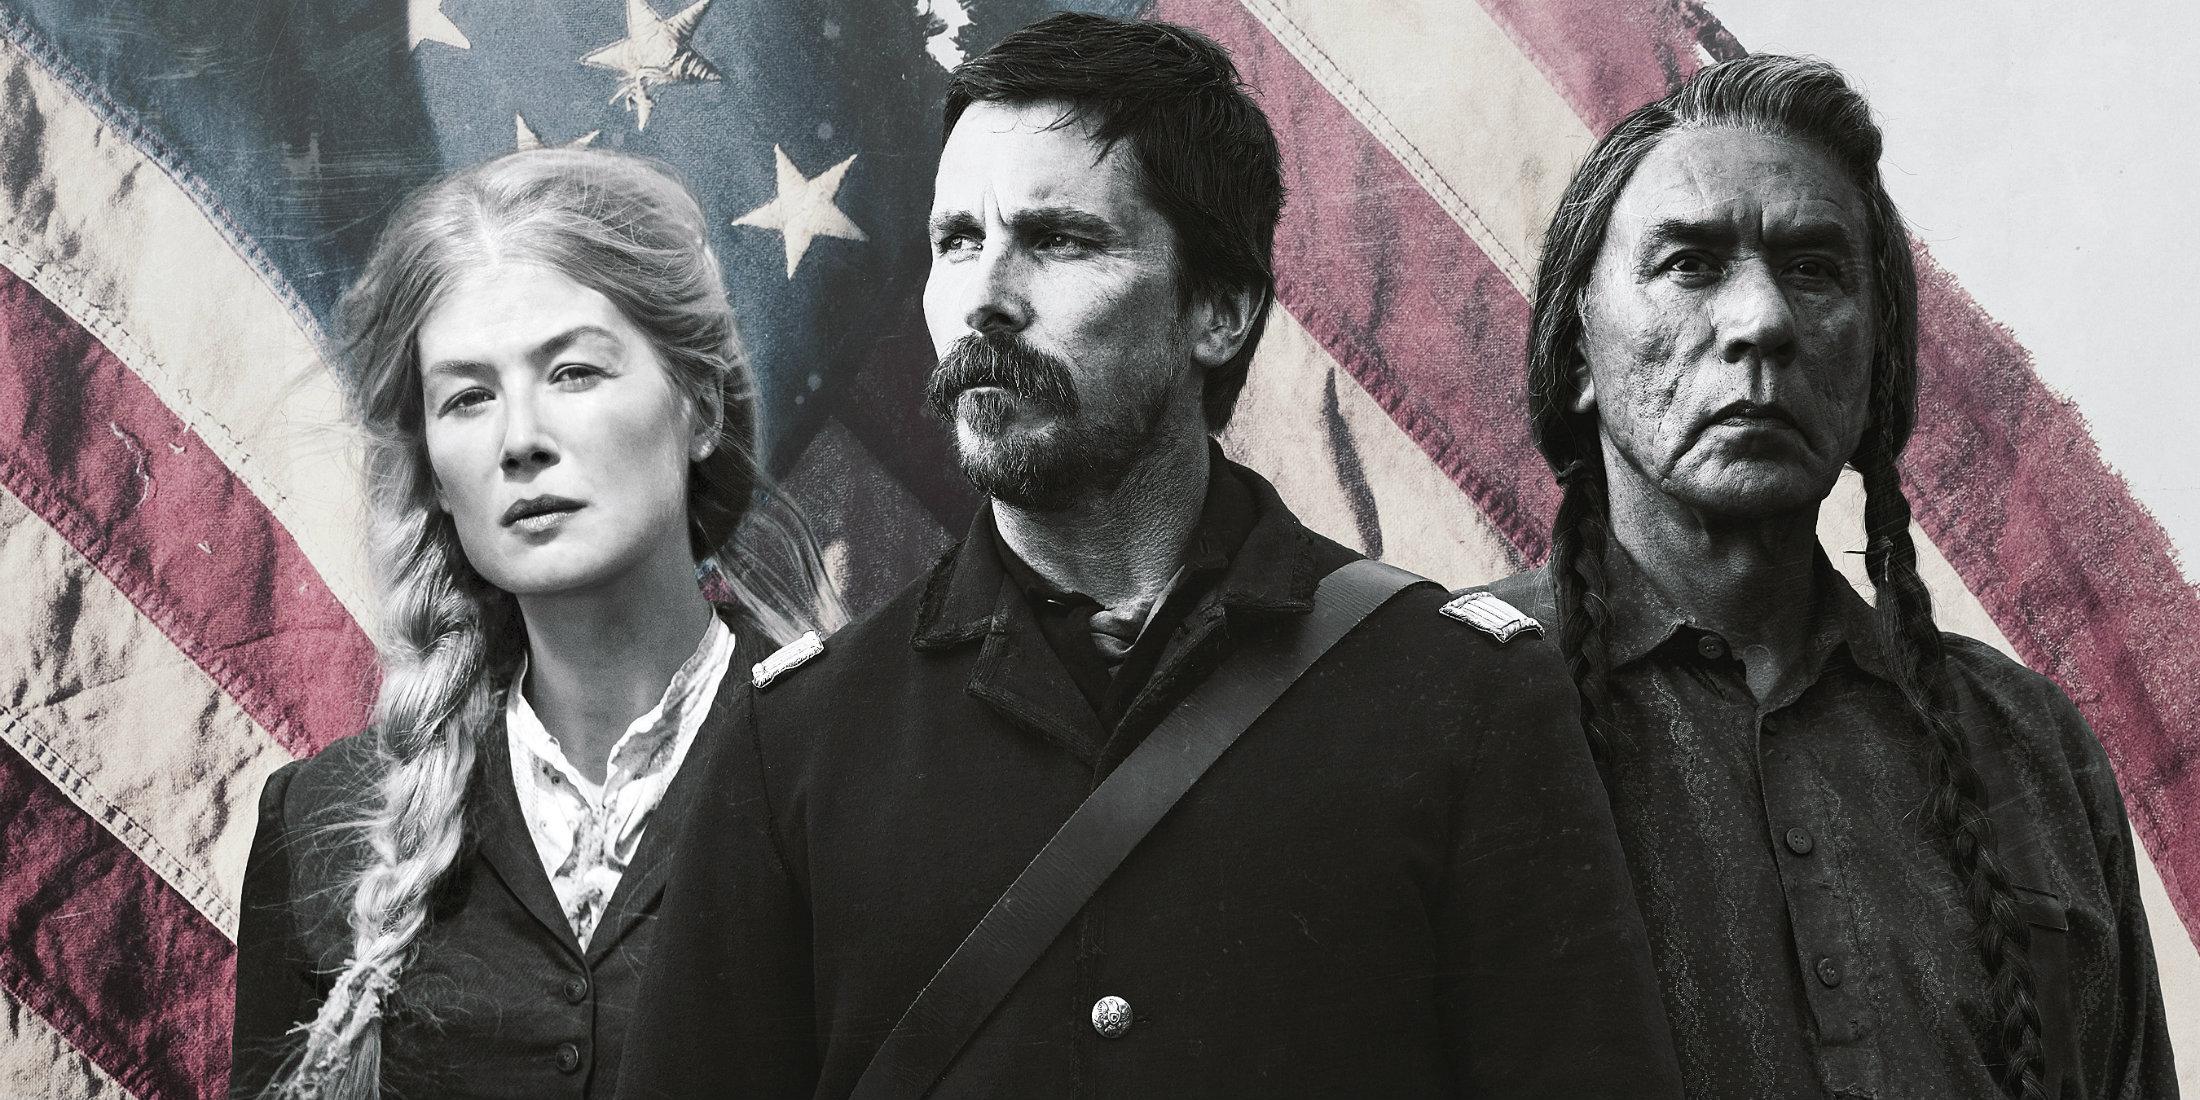 Best Westerns On Netflix To Add To Your Watchlist